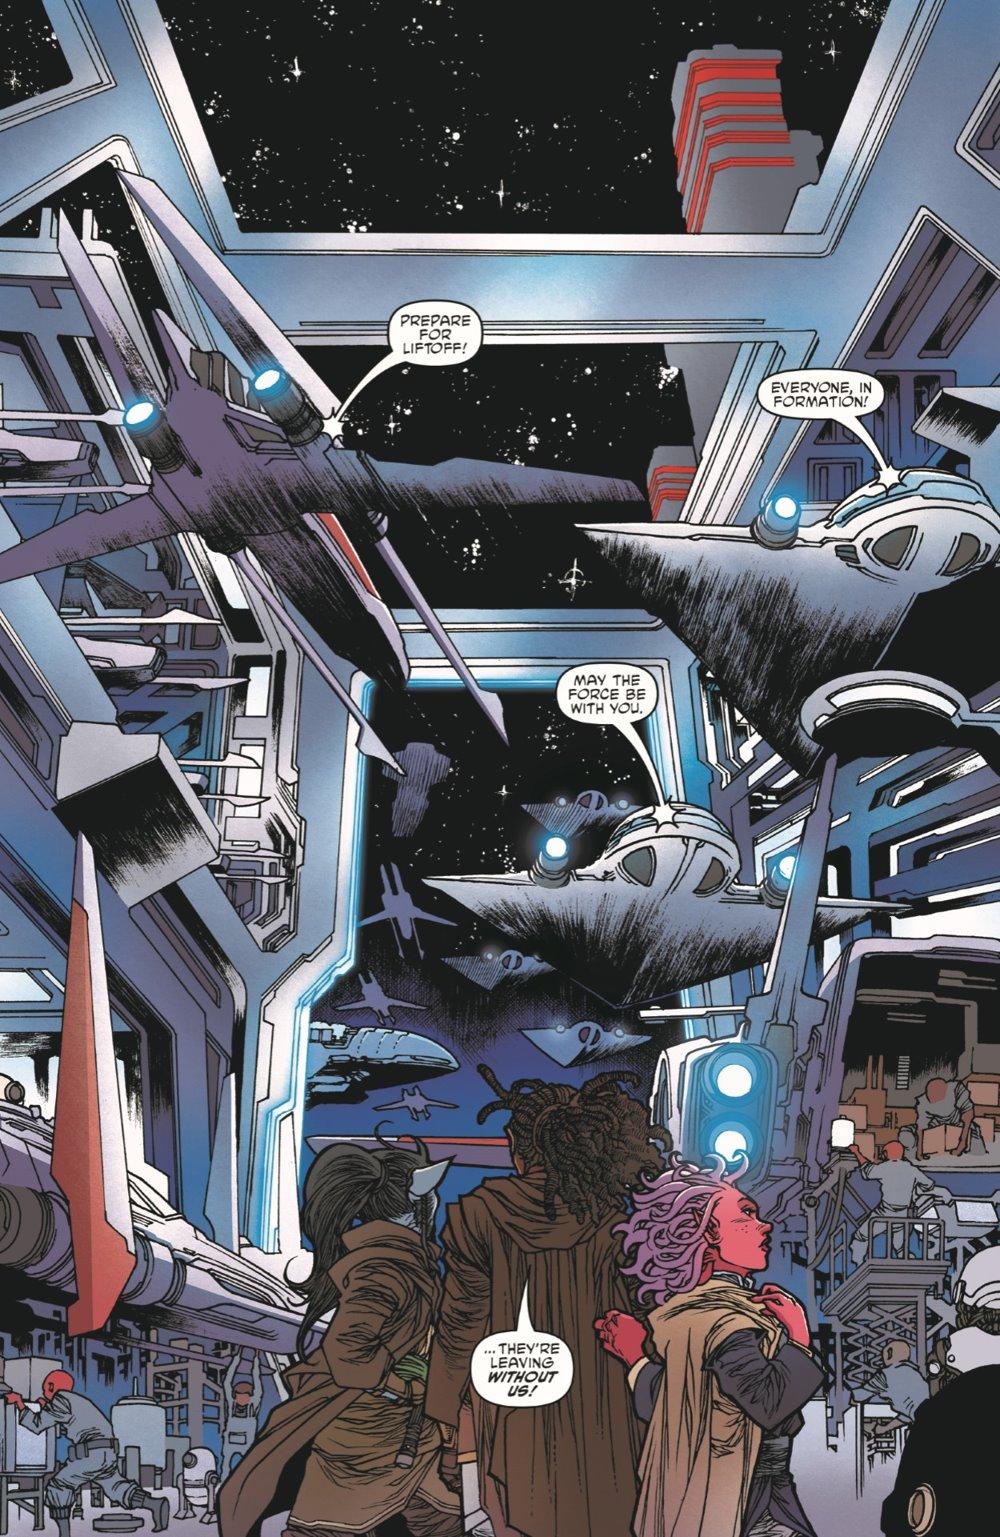 SWAHRA04-pr-07 ComicList Previews: STAR WARS THE HIGH REPUBLIC ADVENTURES #4